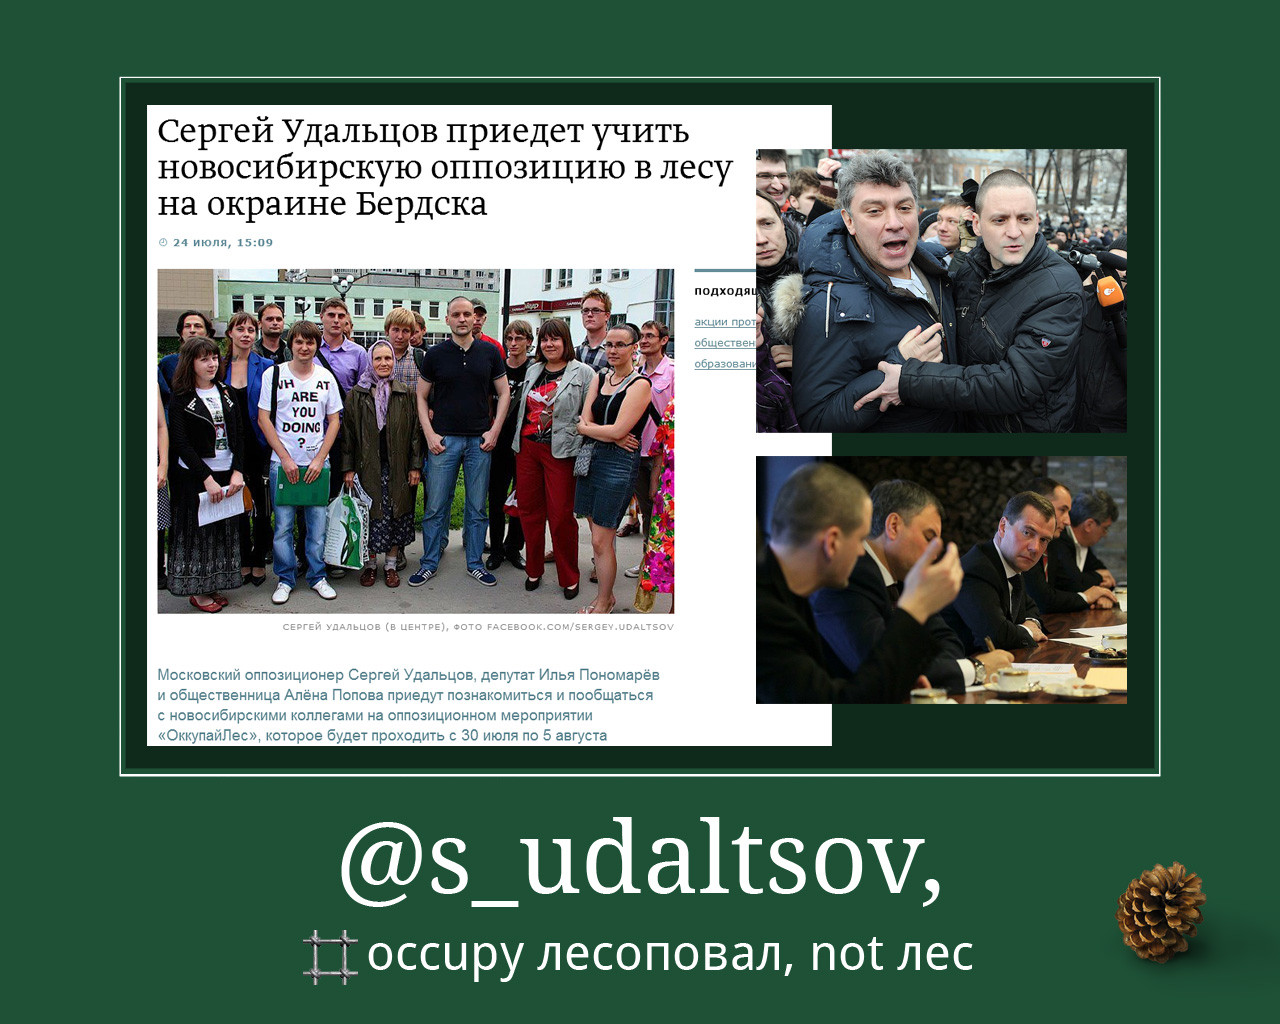 @s_udaltsov, #occupy лесоповал, not лес